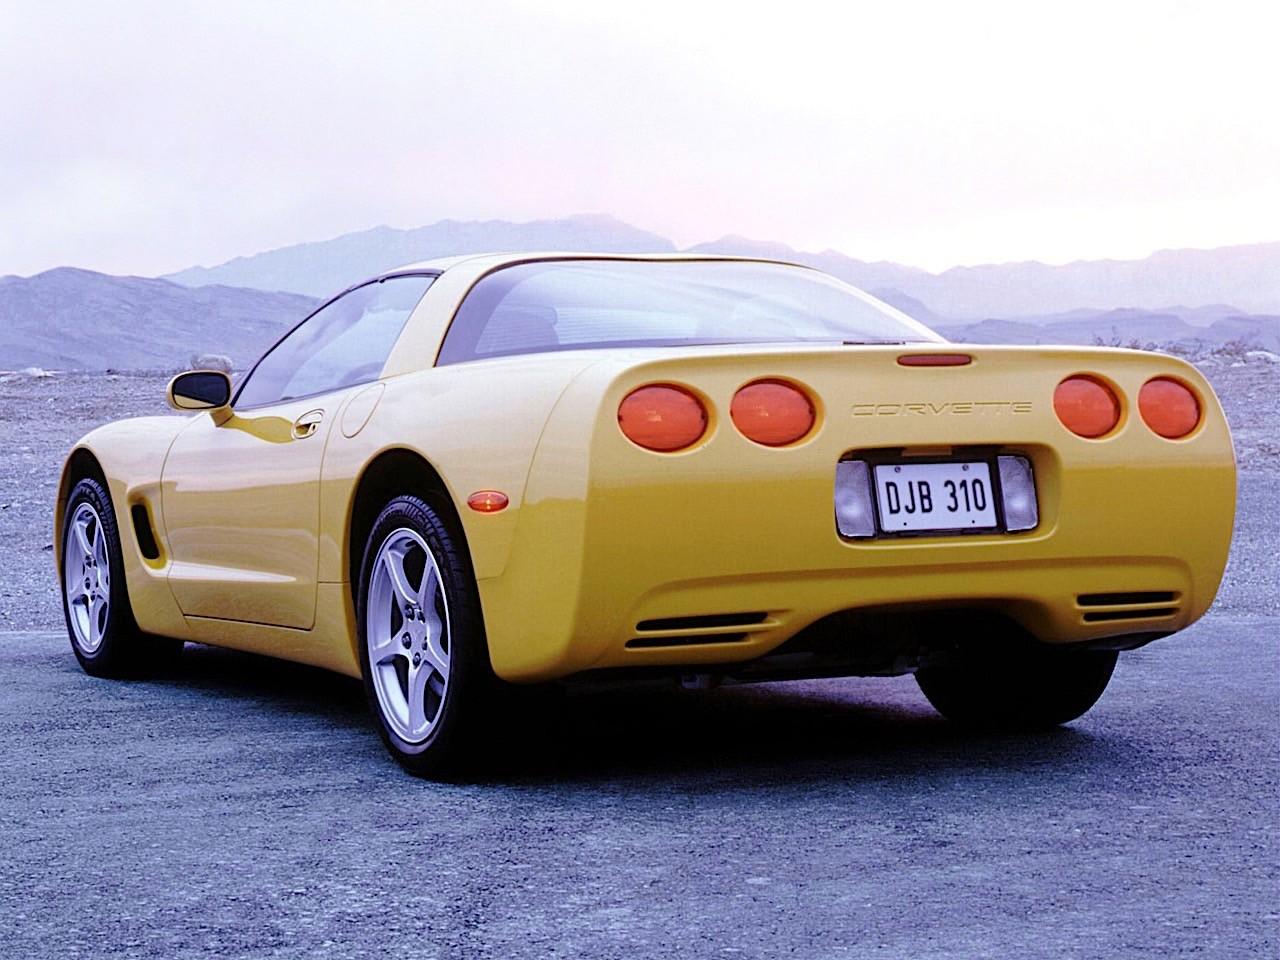 Chevrolet Corvette C Coupe